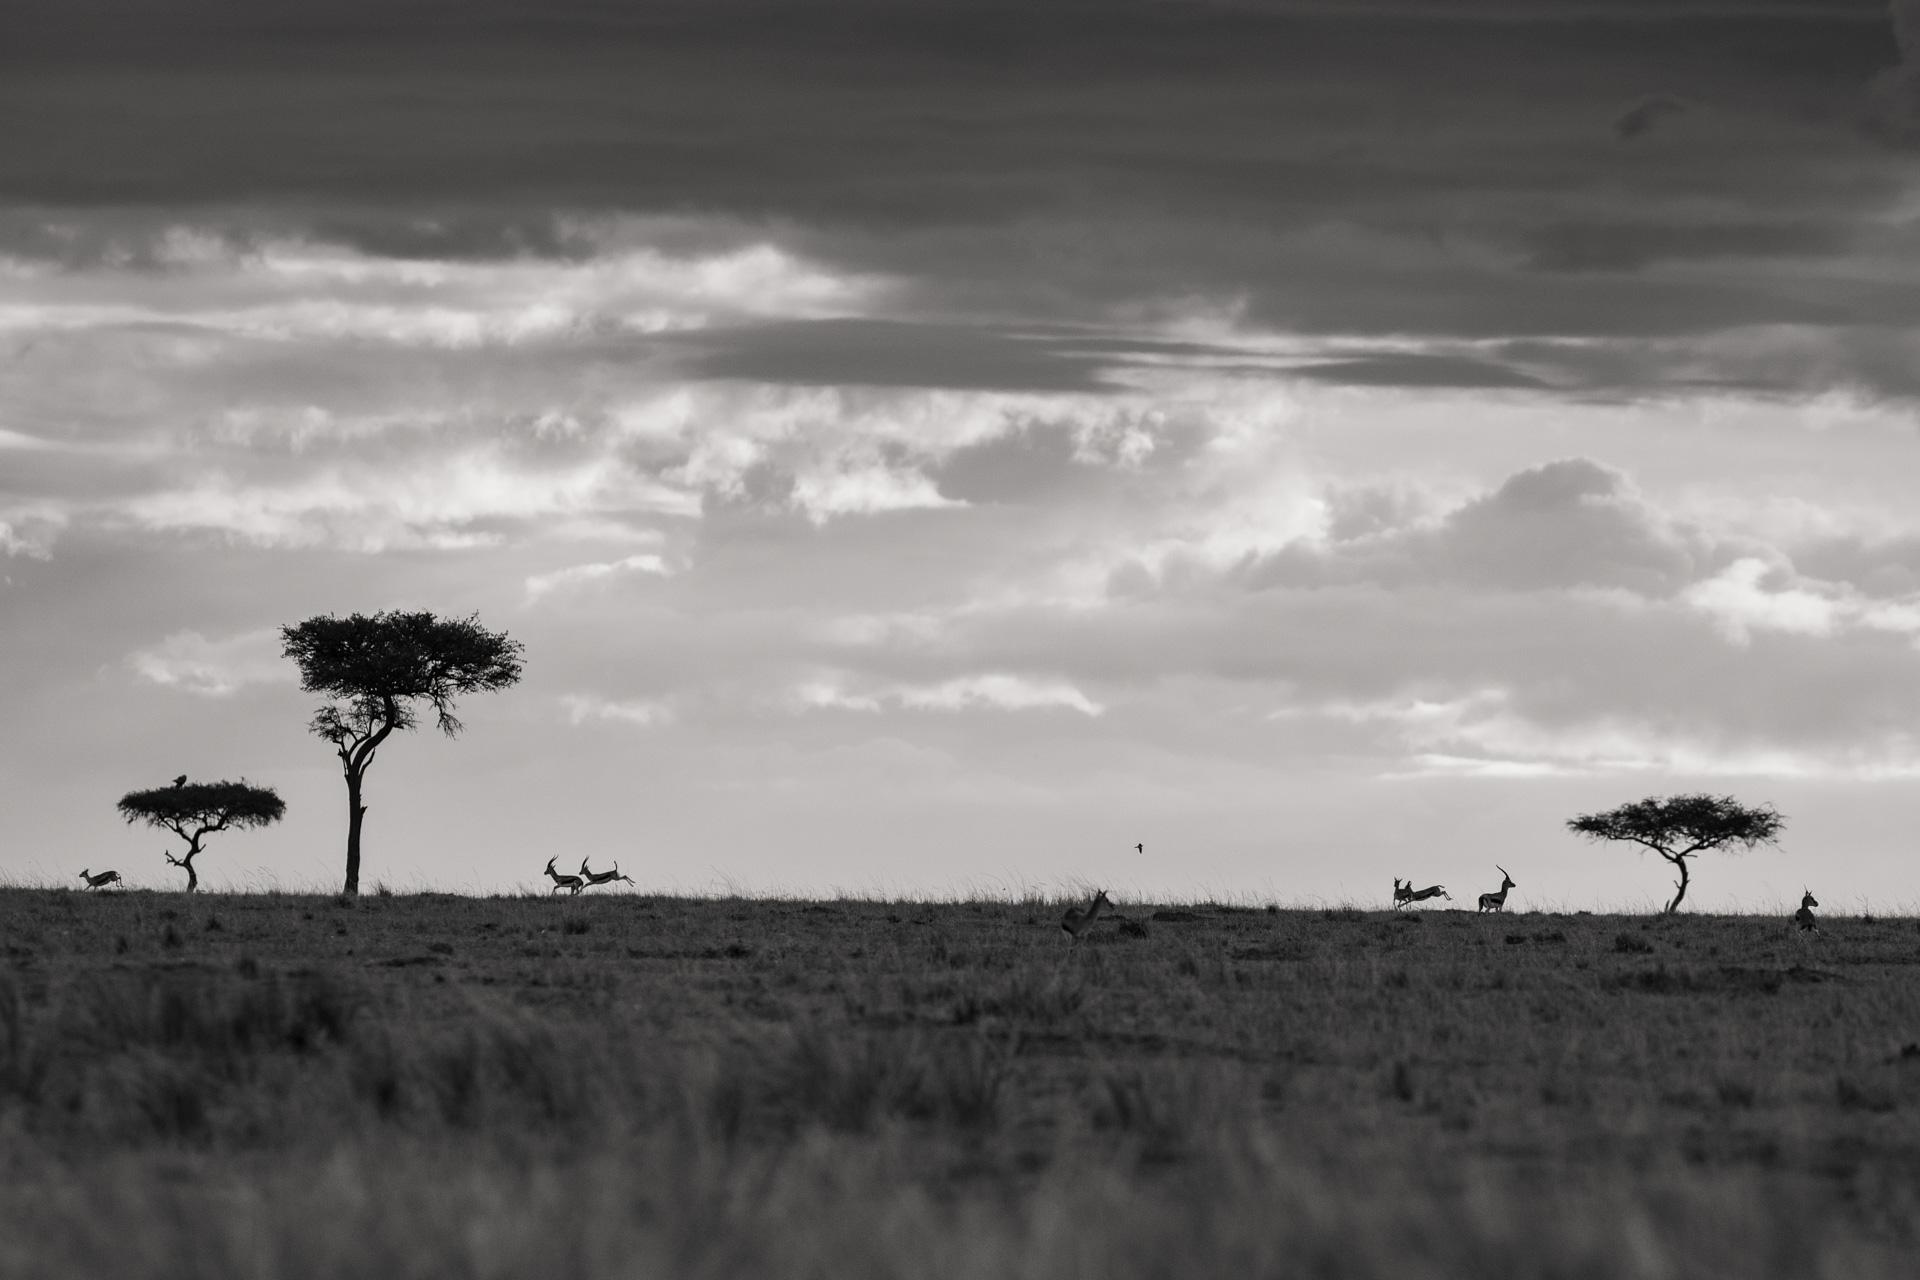 Gazelles and landscape